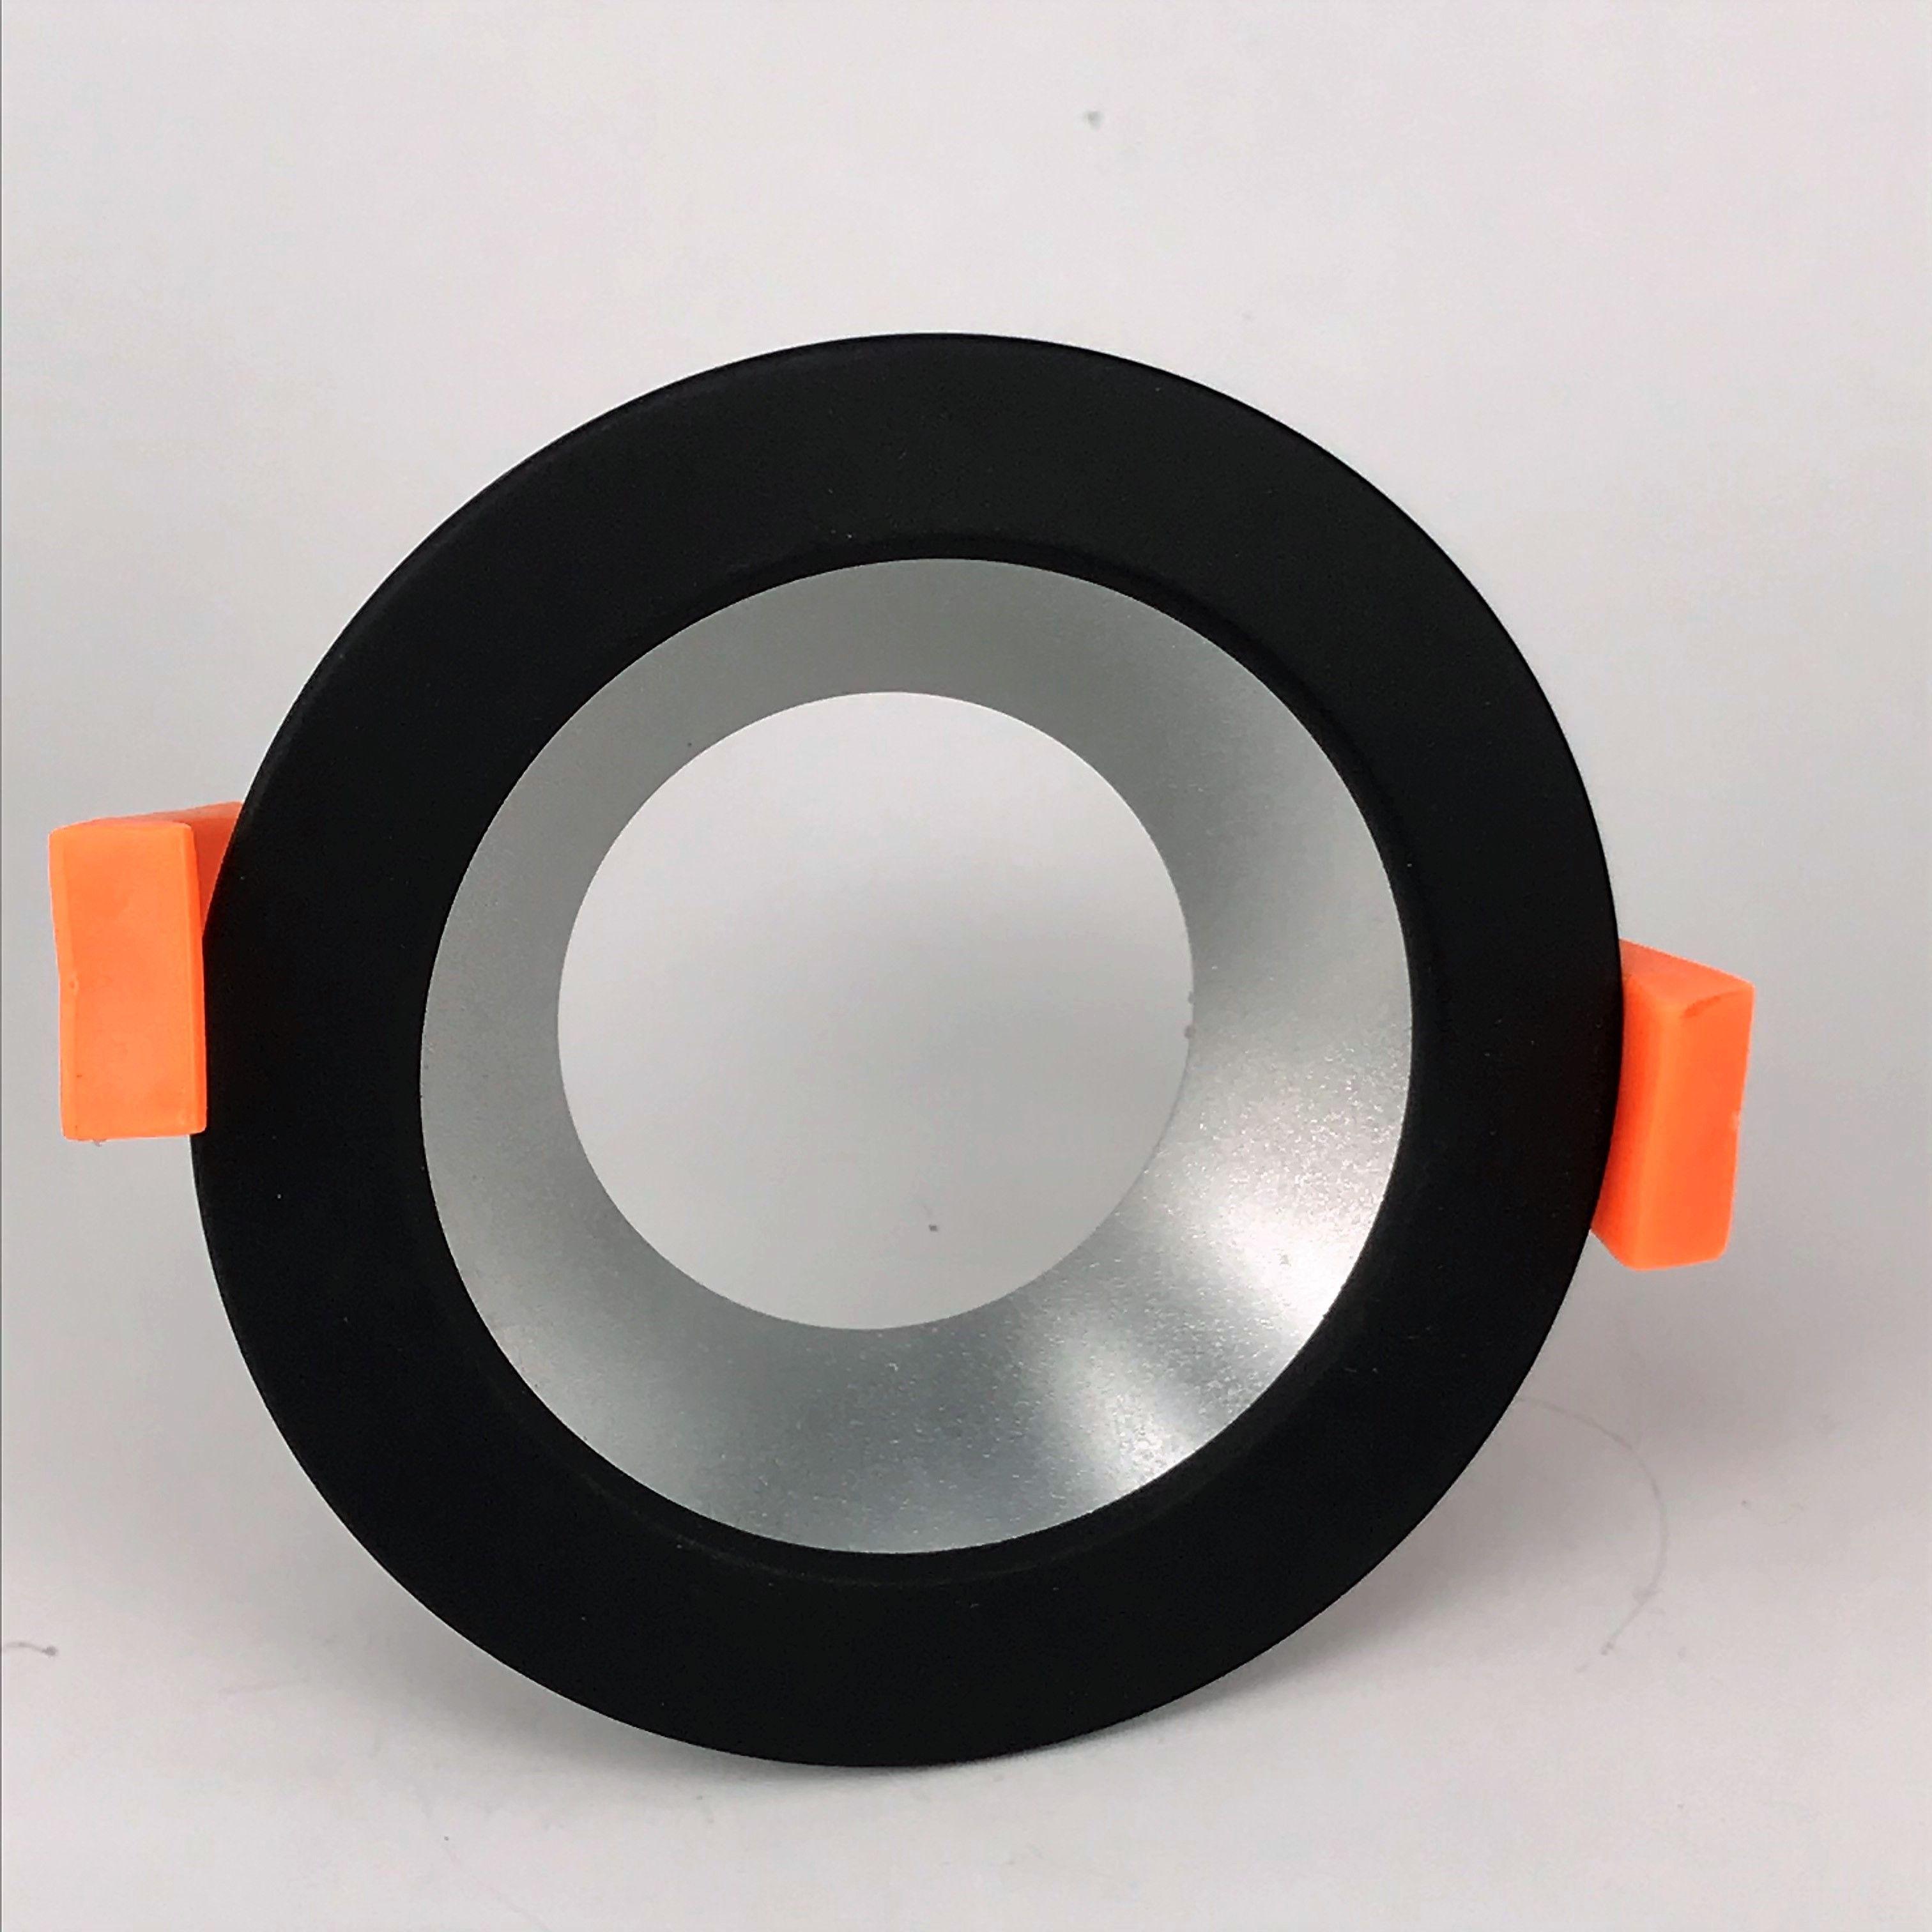 Inbouwring 85mm rond zwart-zilver